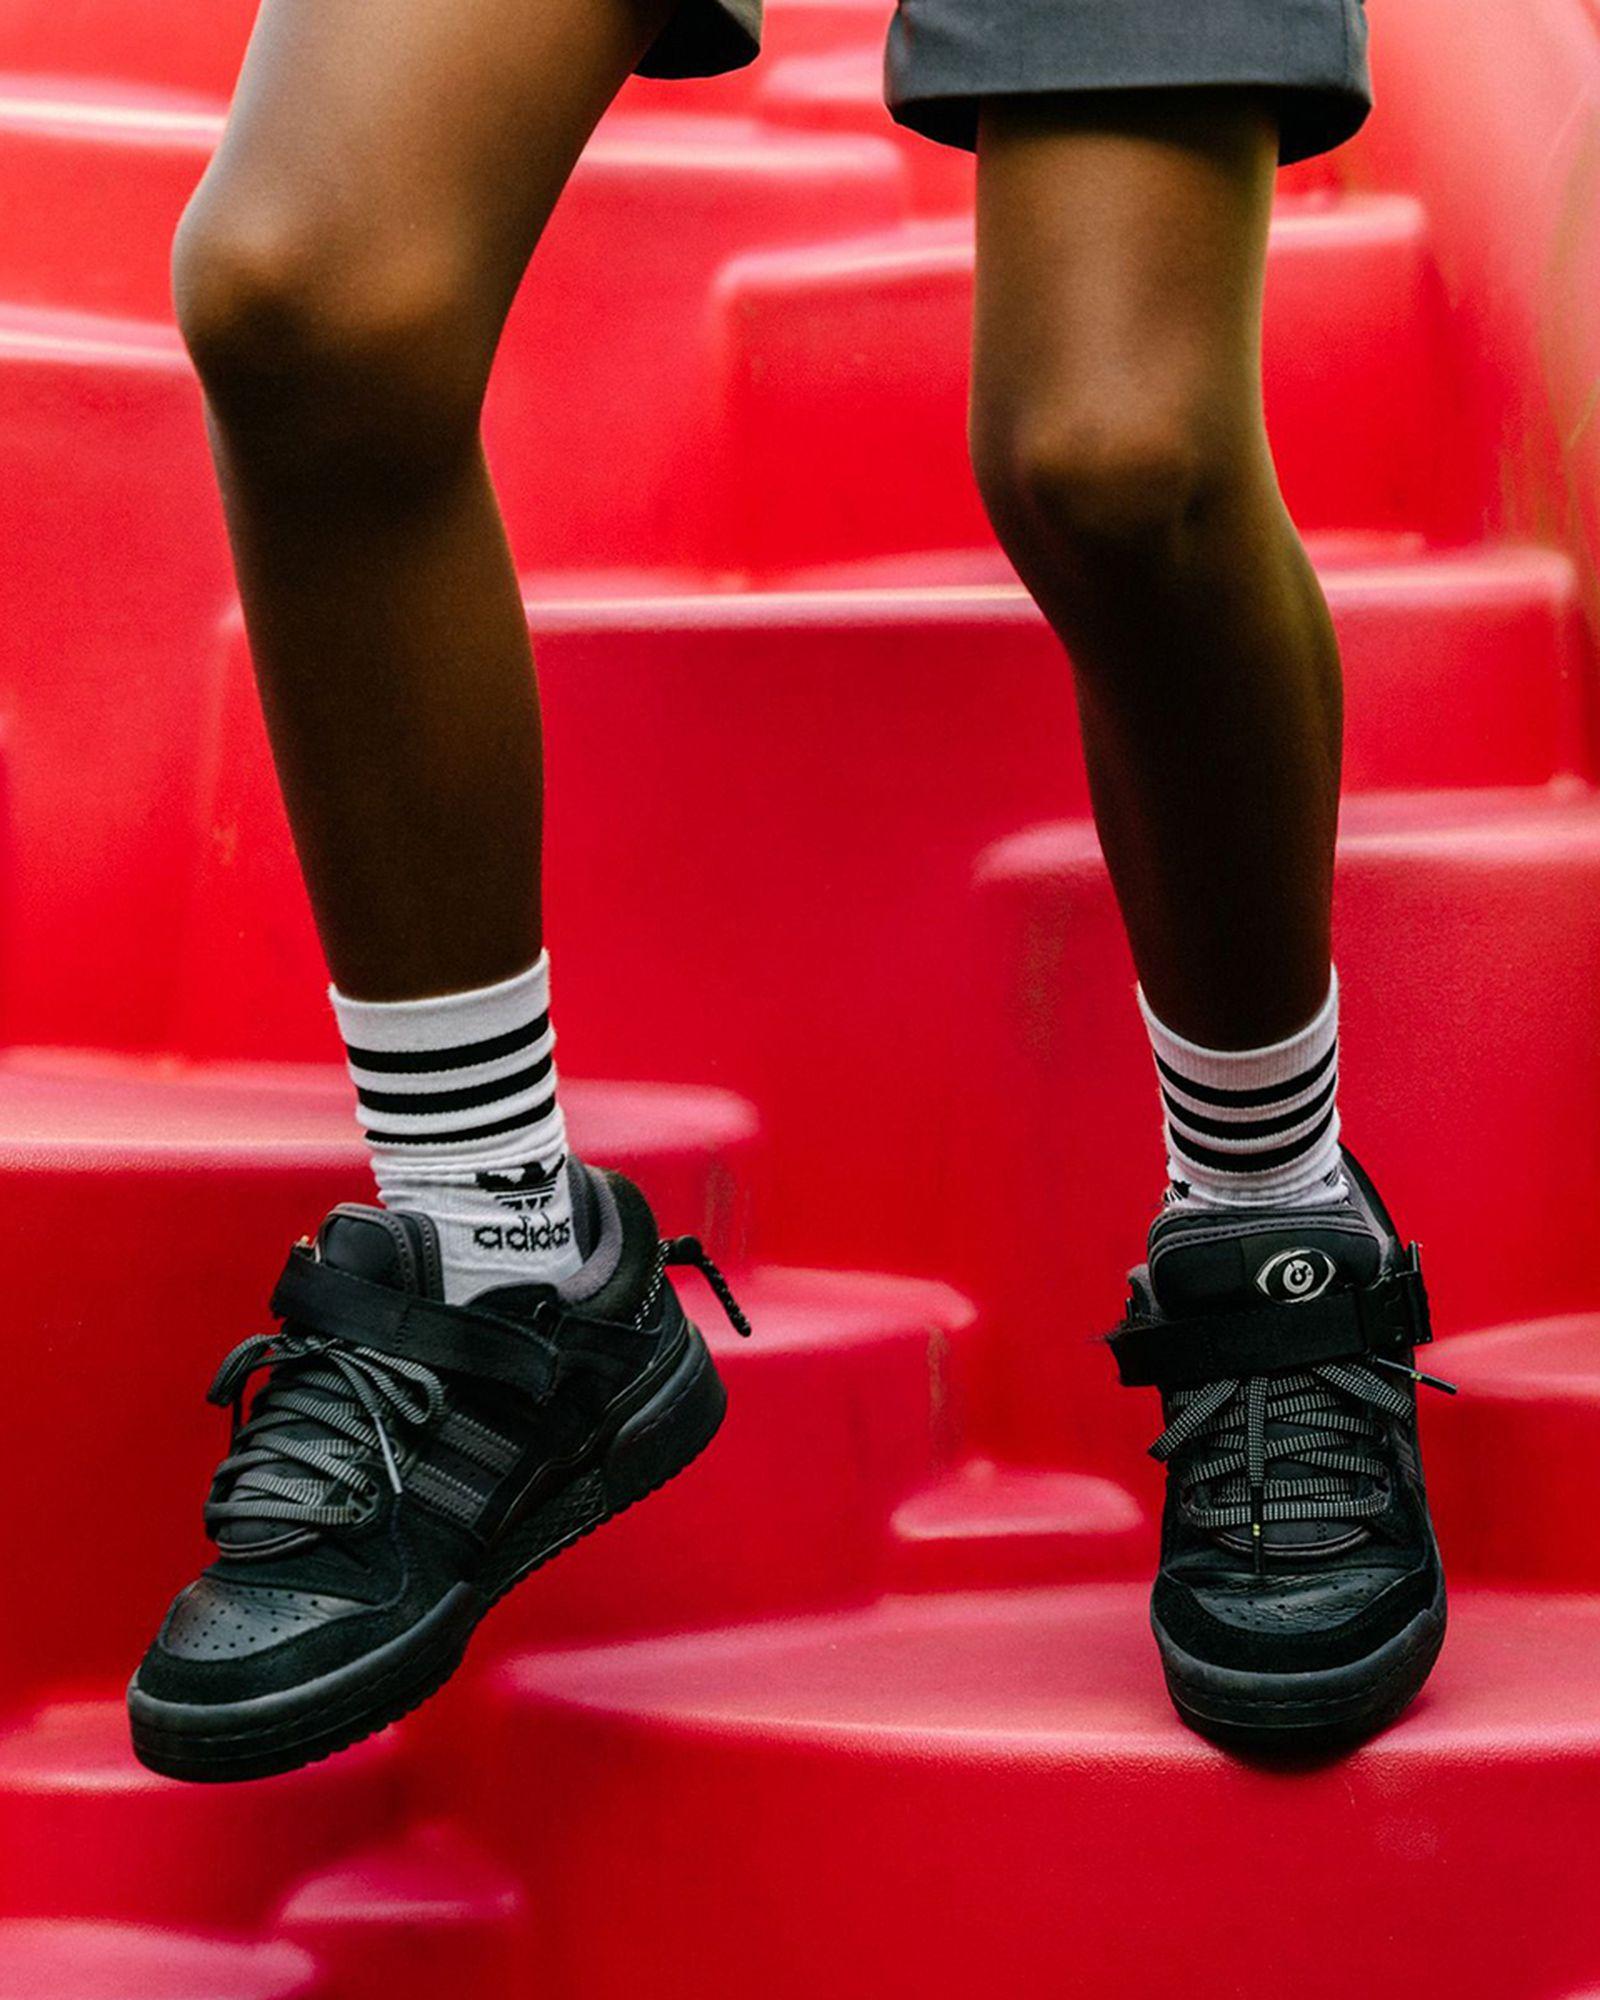 bad-bunny-adidas-originals-forum-low-triple-black-release-date-price-01